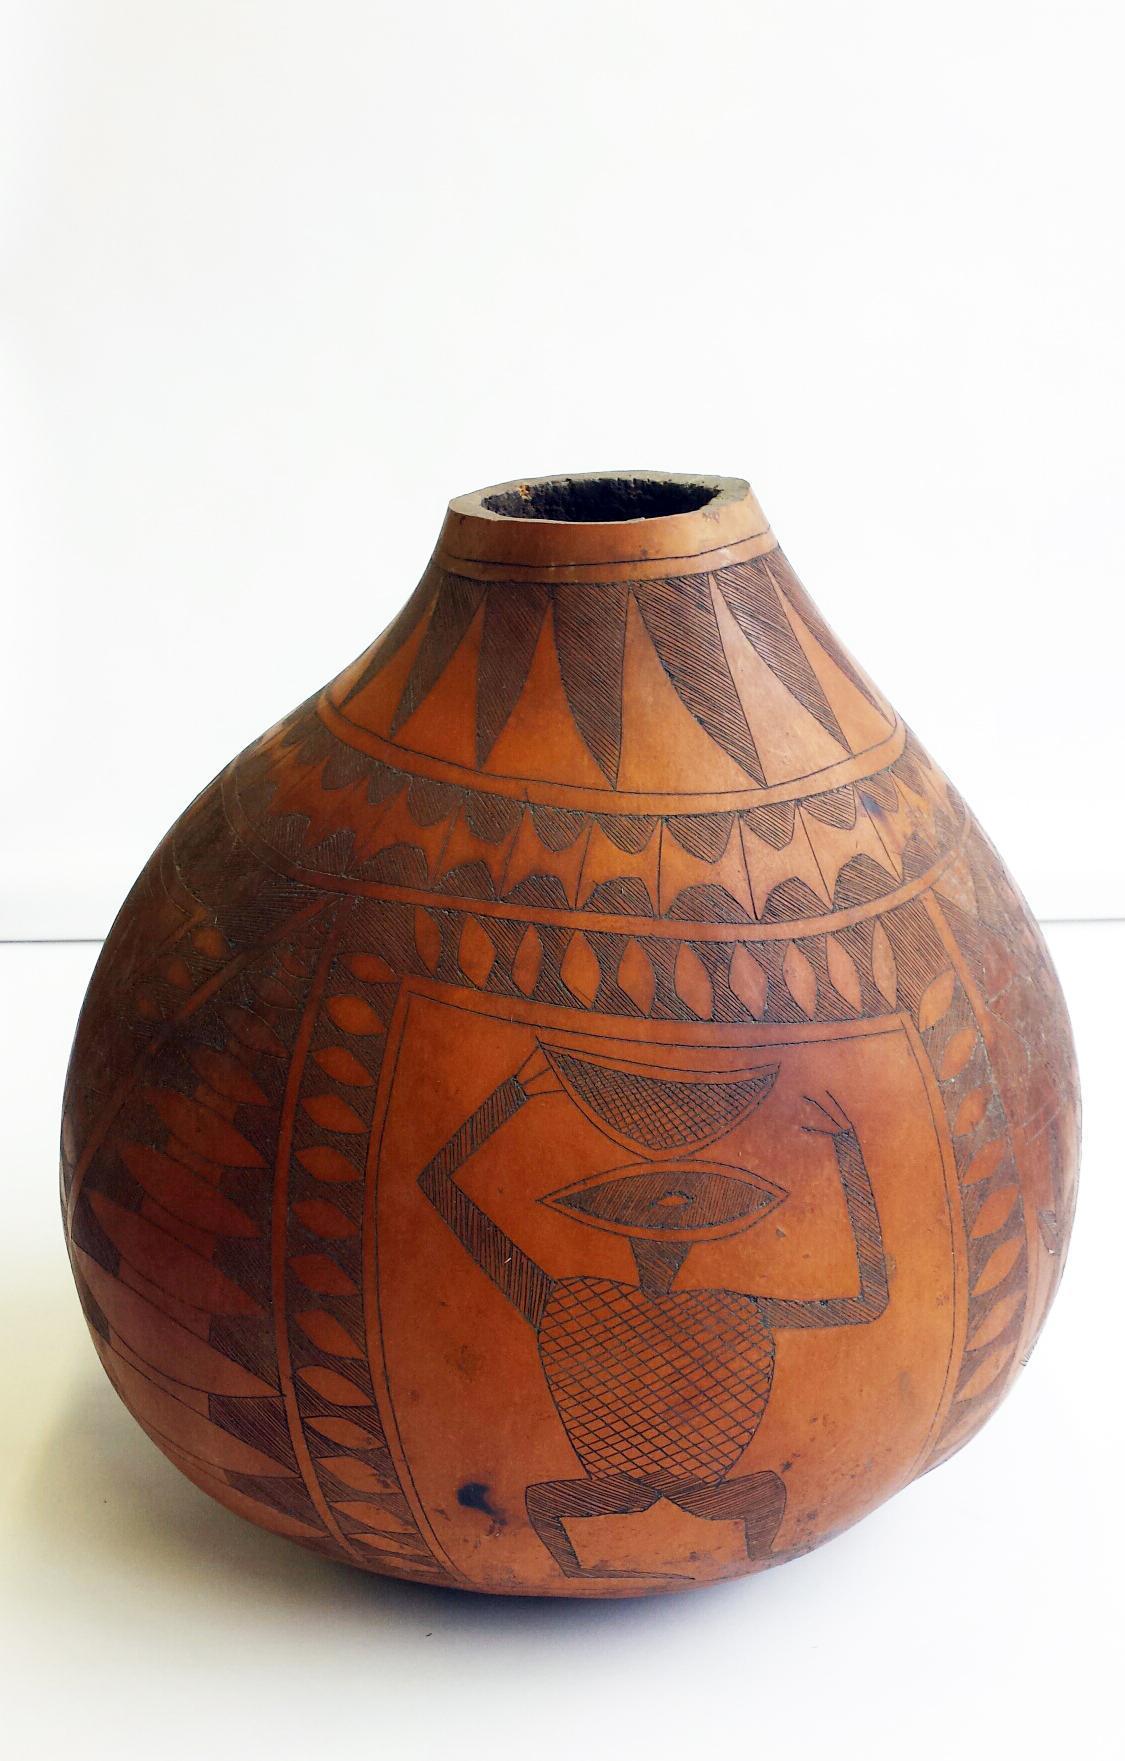 Carved African Gourd From Juan Montoya Design On Rubylux